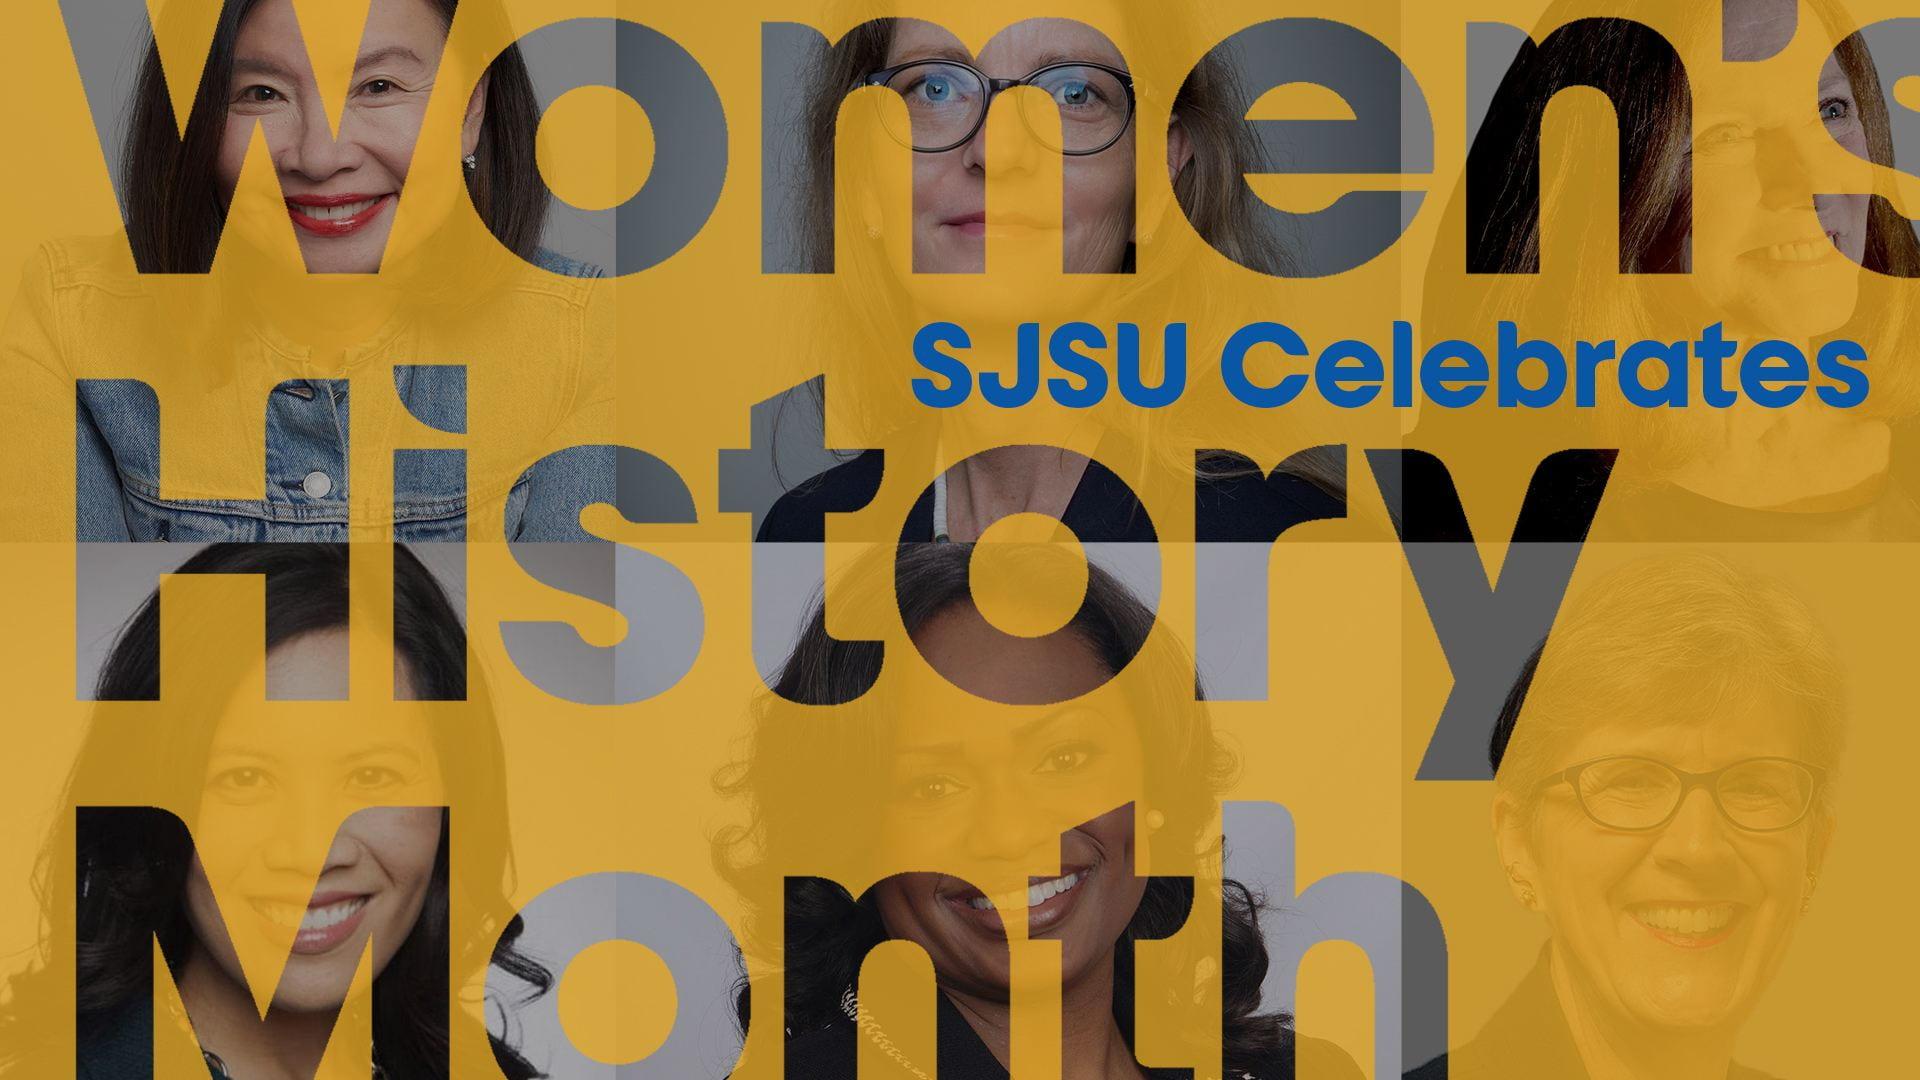 SJSU Celebrates Women's History Month